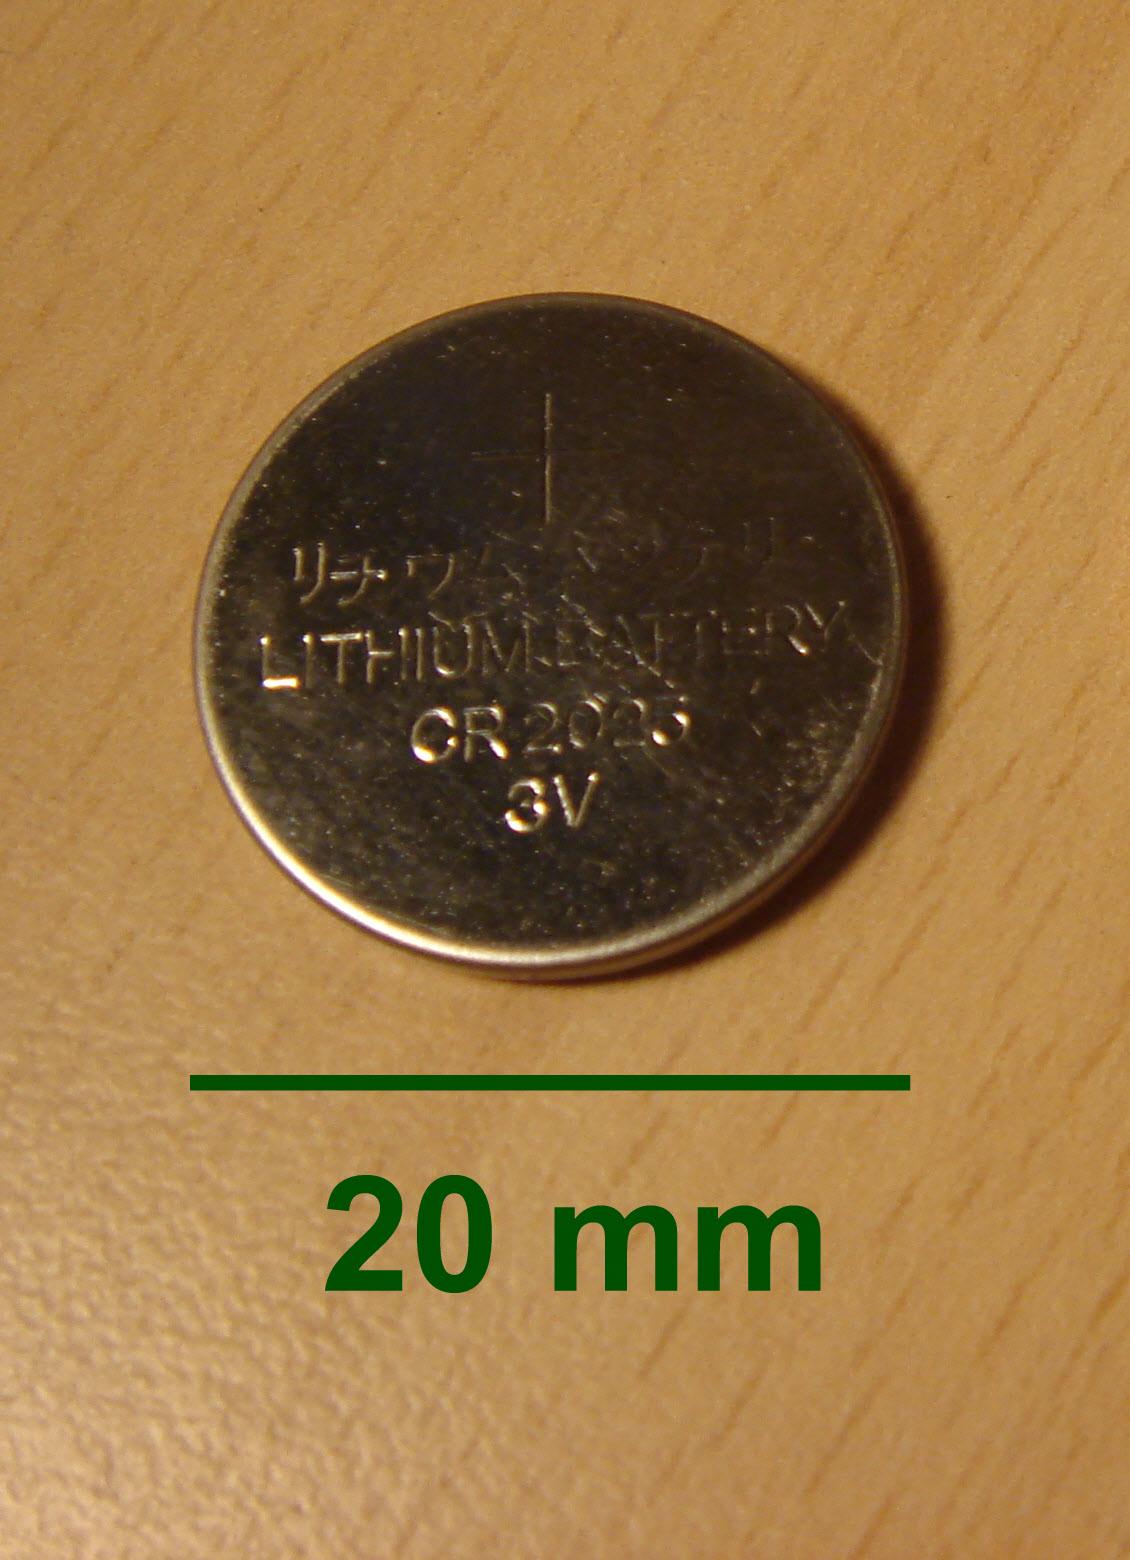 File:Battery - cr2025 JPG - Wikipedia